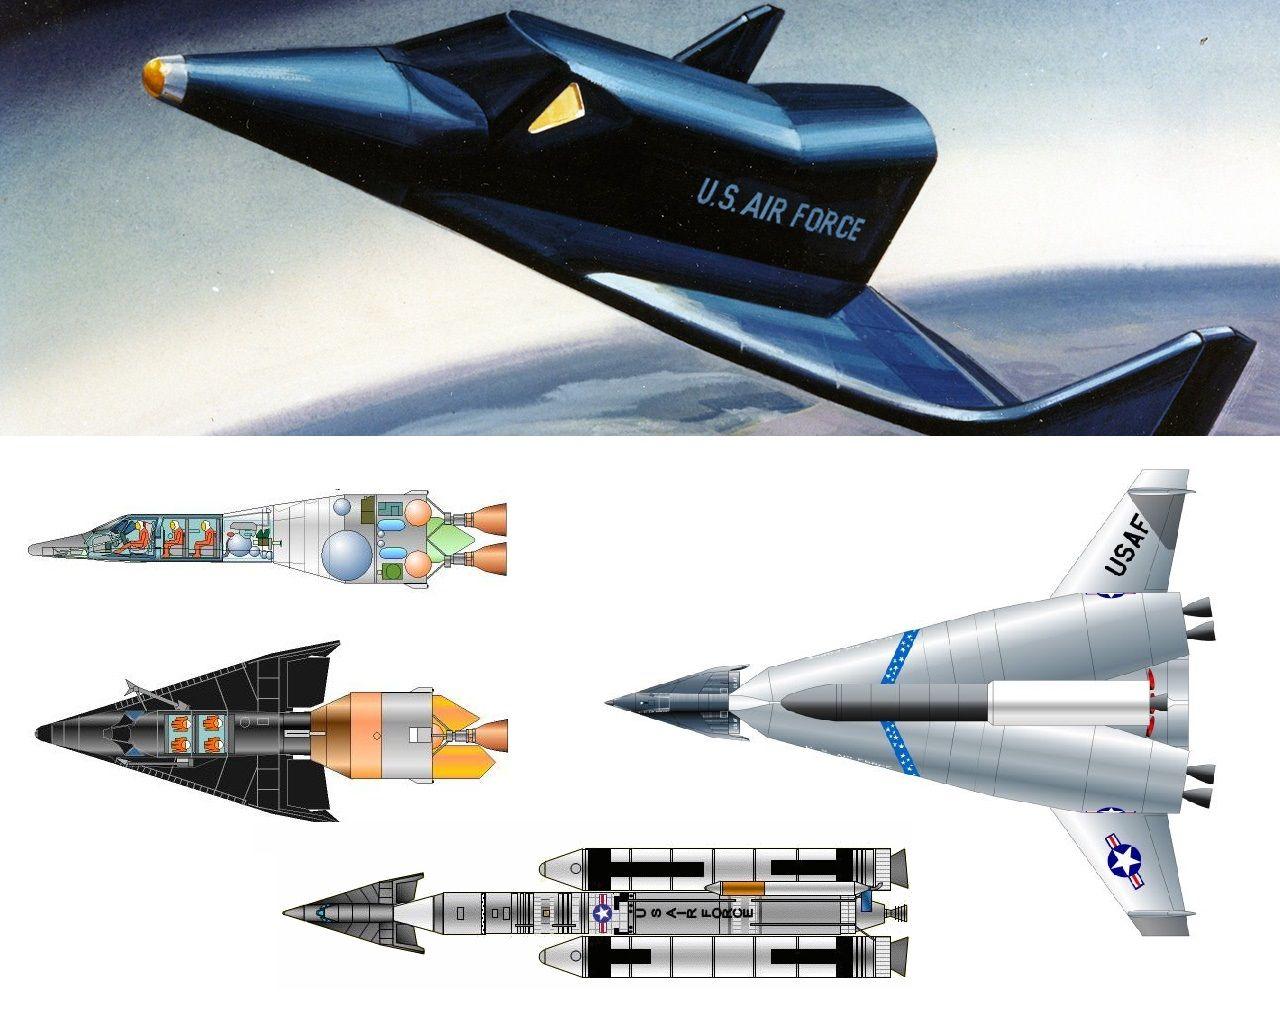 boeing space program - photo #26